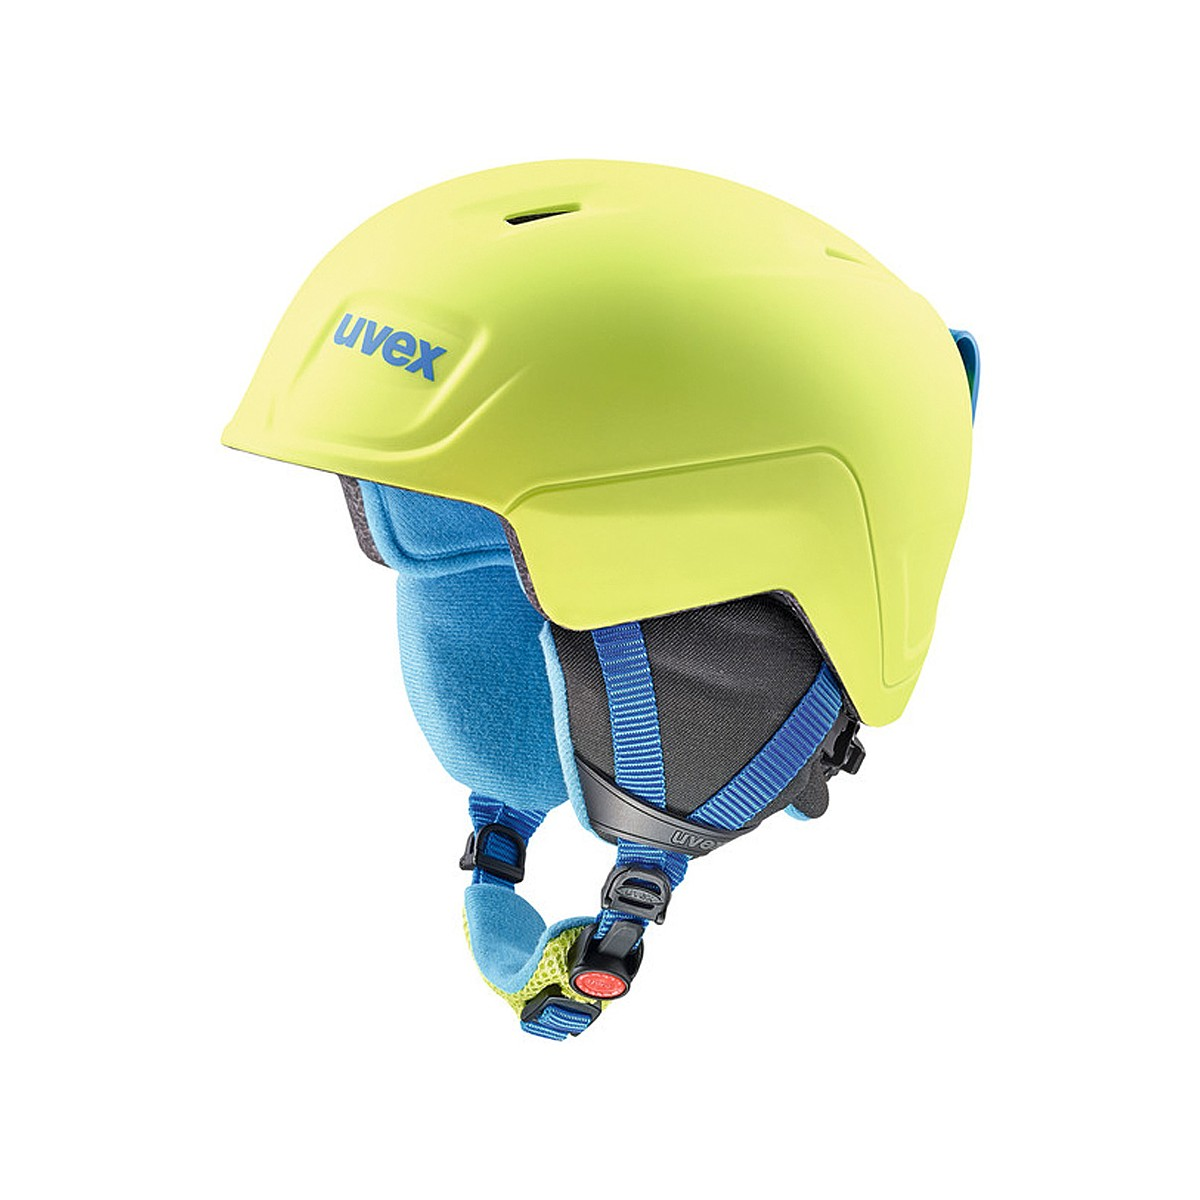 Casco sci Uvex Manic Pro (Colore: blue-lime met mat, Taglia: 51/55)